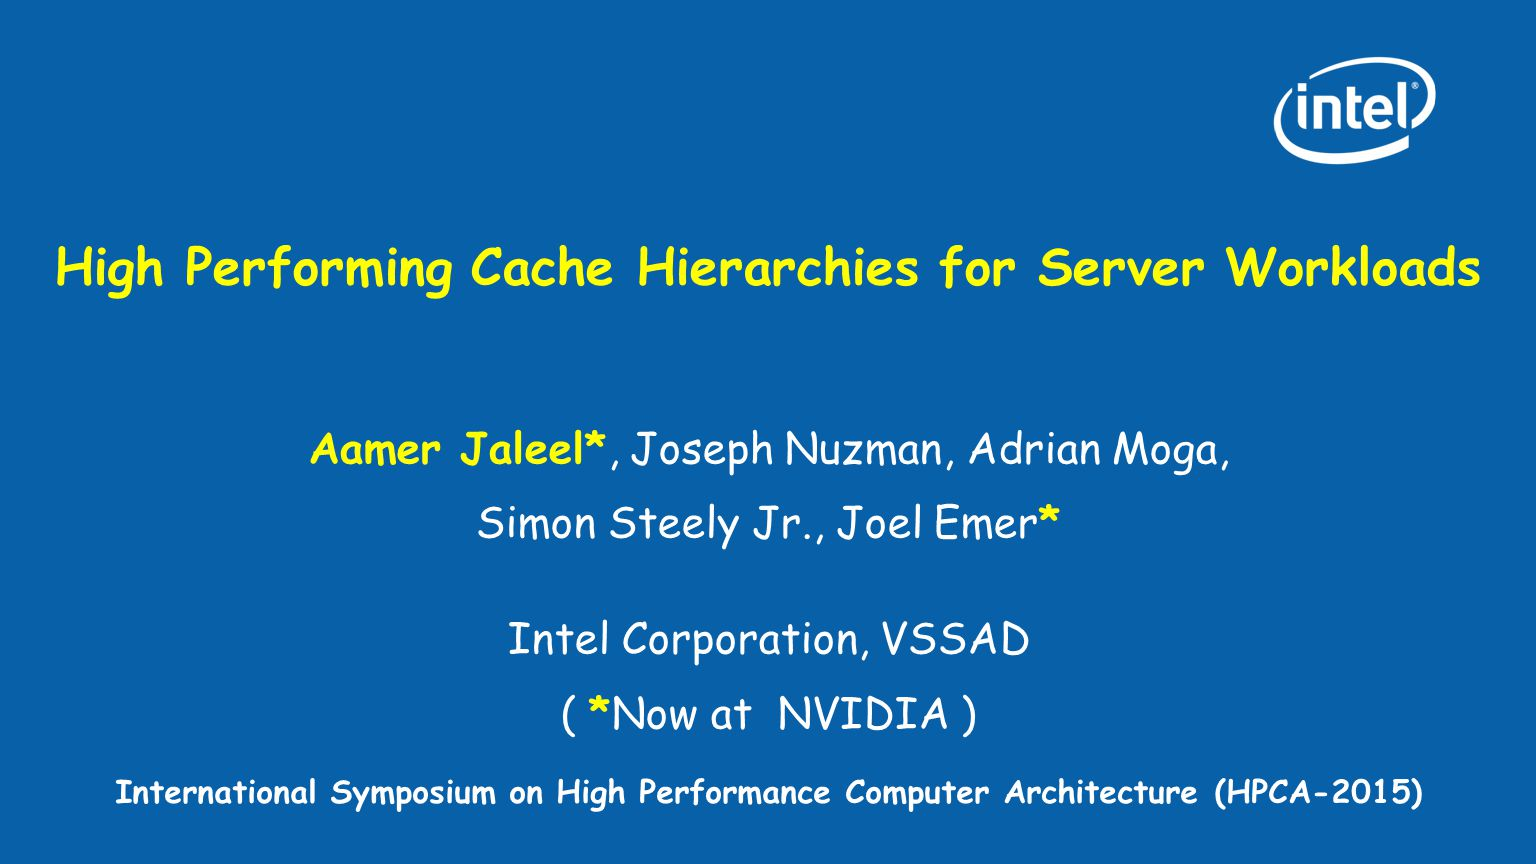 High Performing Cache Hierarchies for Server Workloads Aamer Jaleel*, Joseph Nuzman, Adrian Moga, Simon Steely Jr., Joel Emer* Intel Corporation, VSSA